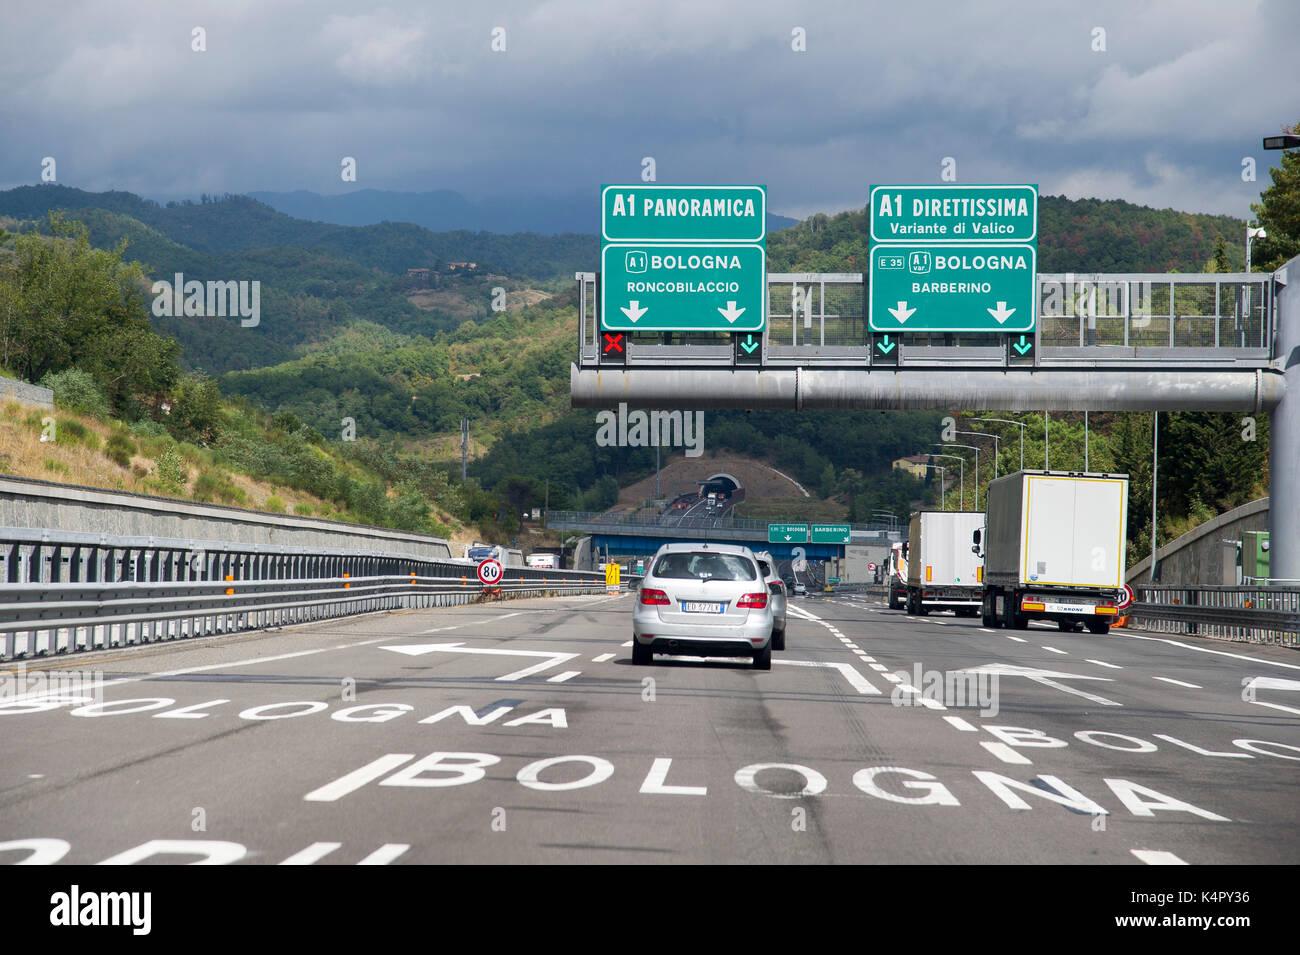 milano bologna autostrada tempo percorrenza - photo#12